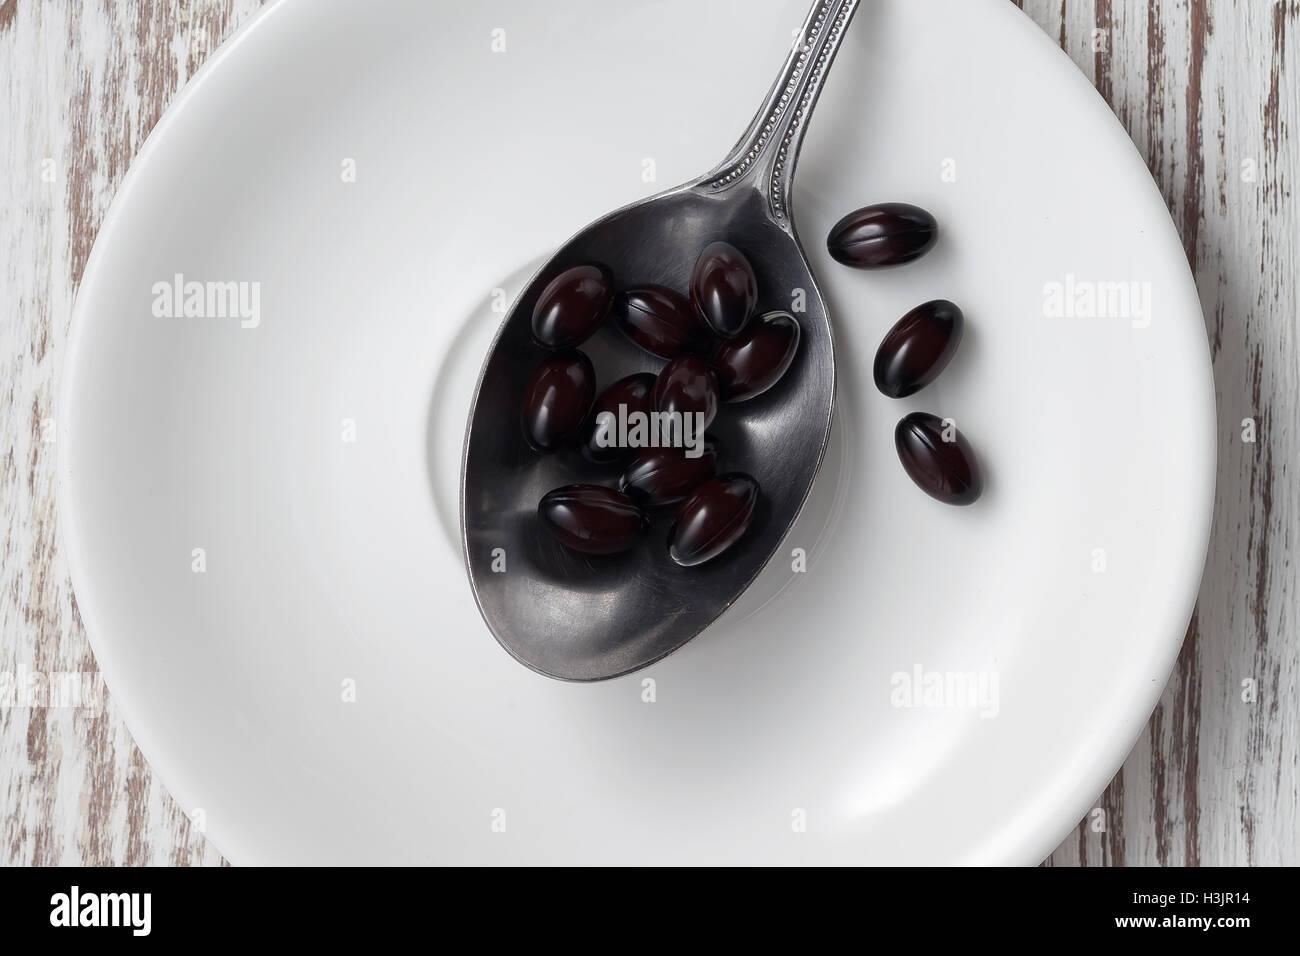 Suplemento antioxidante astaxantina todavía la vida saludable alternativa de fondo blanco. Imagen De Stock